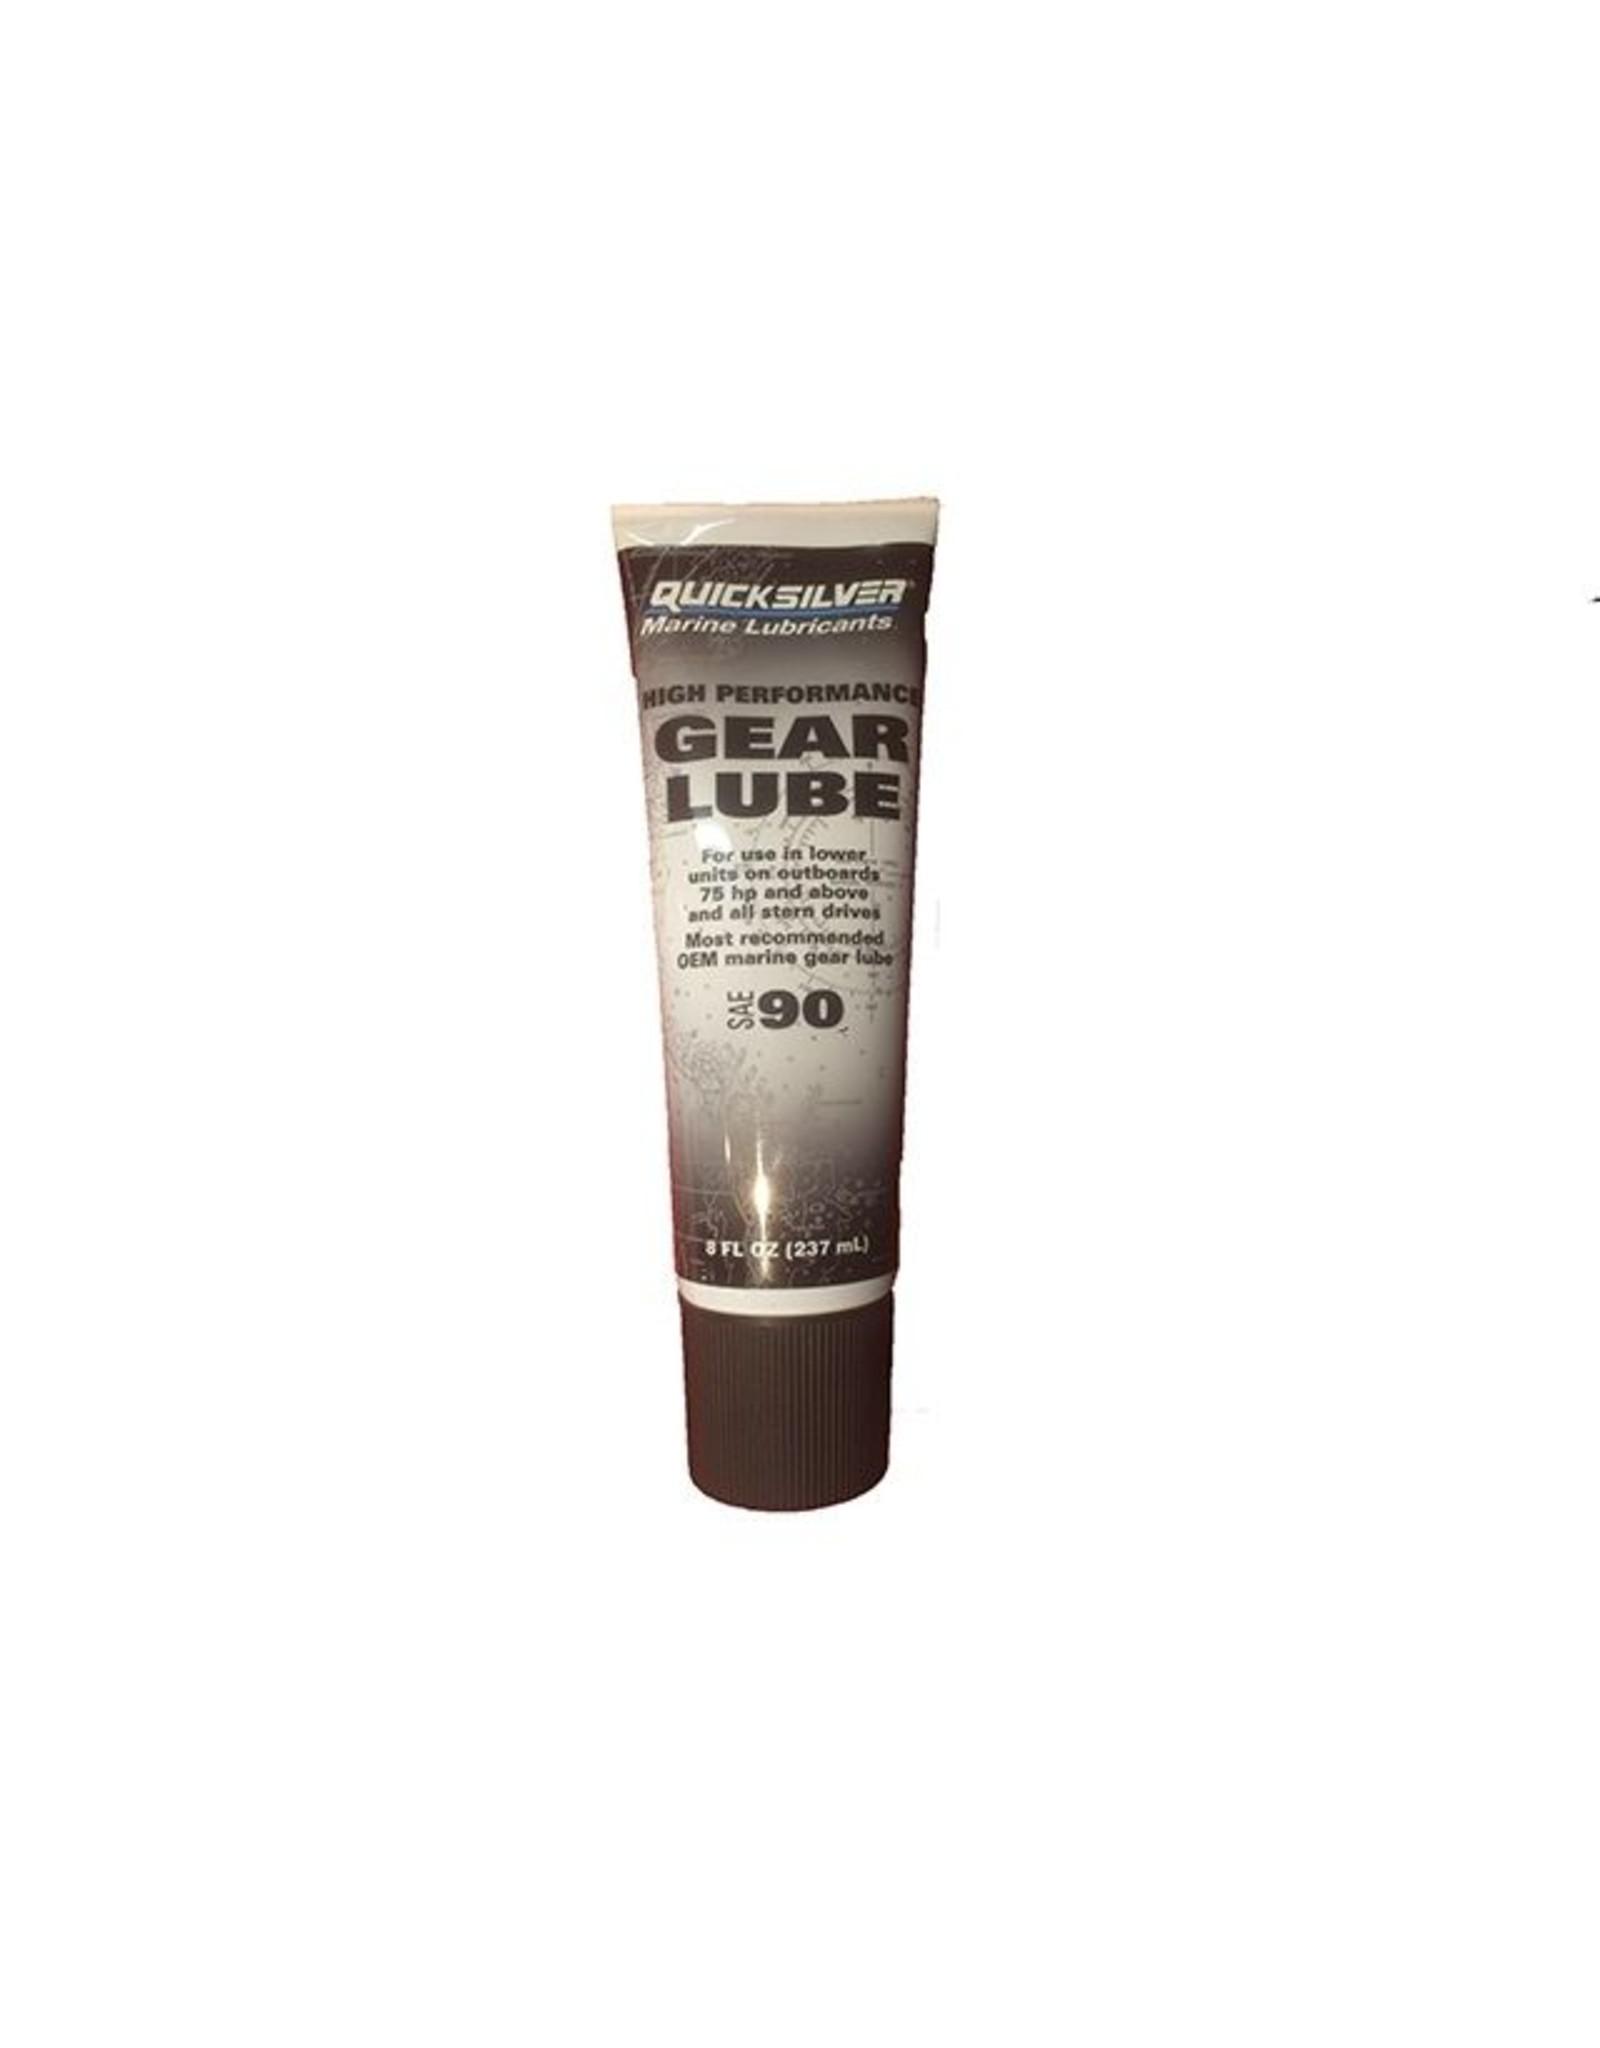 Quicksilver Quicksilver high performance gear lube 237 ml